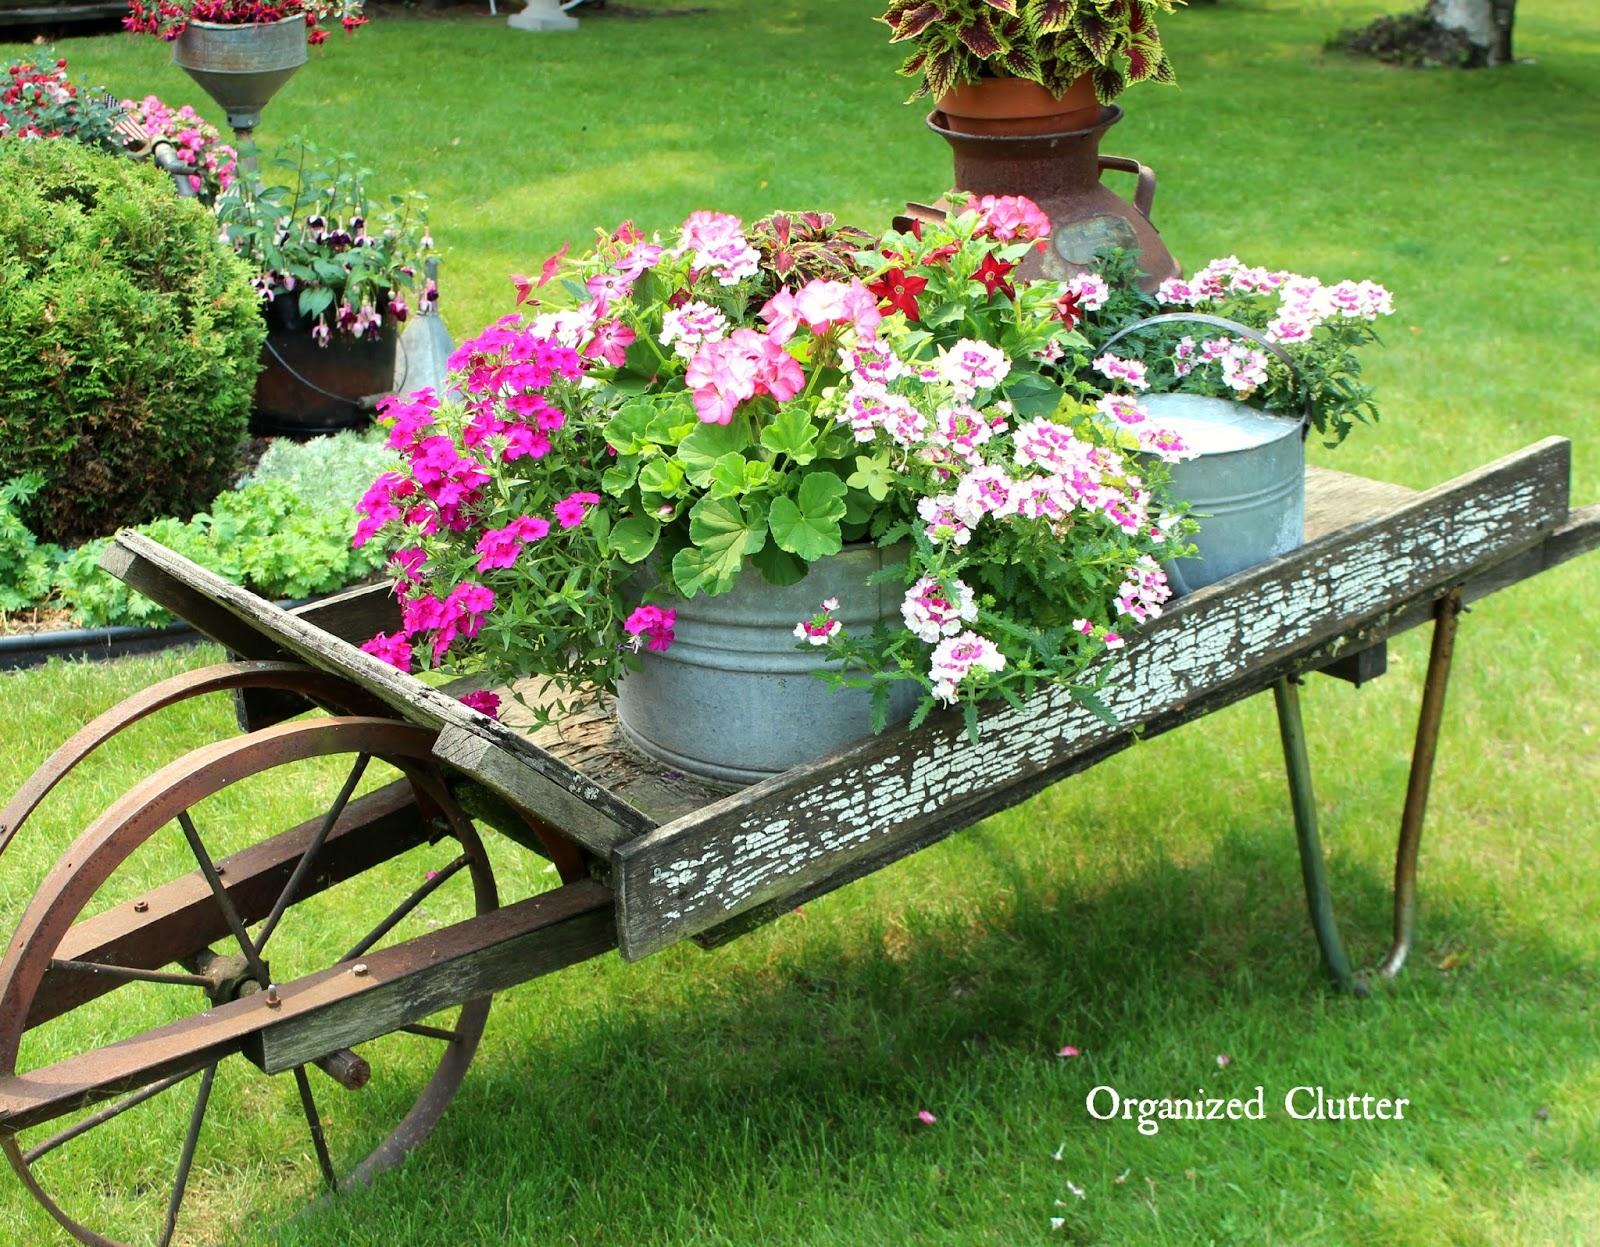 Rustic Garden Wheelbarrow 2015 | Organized Clutter